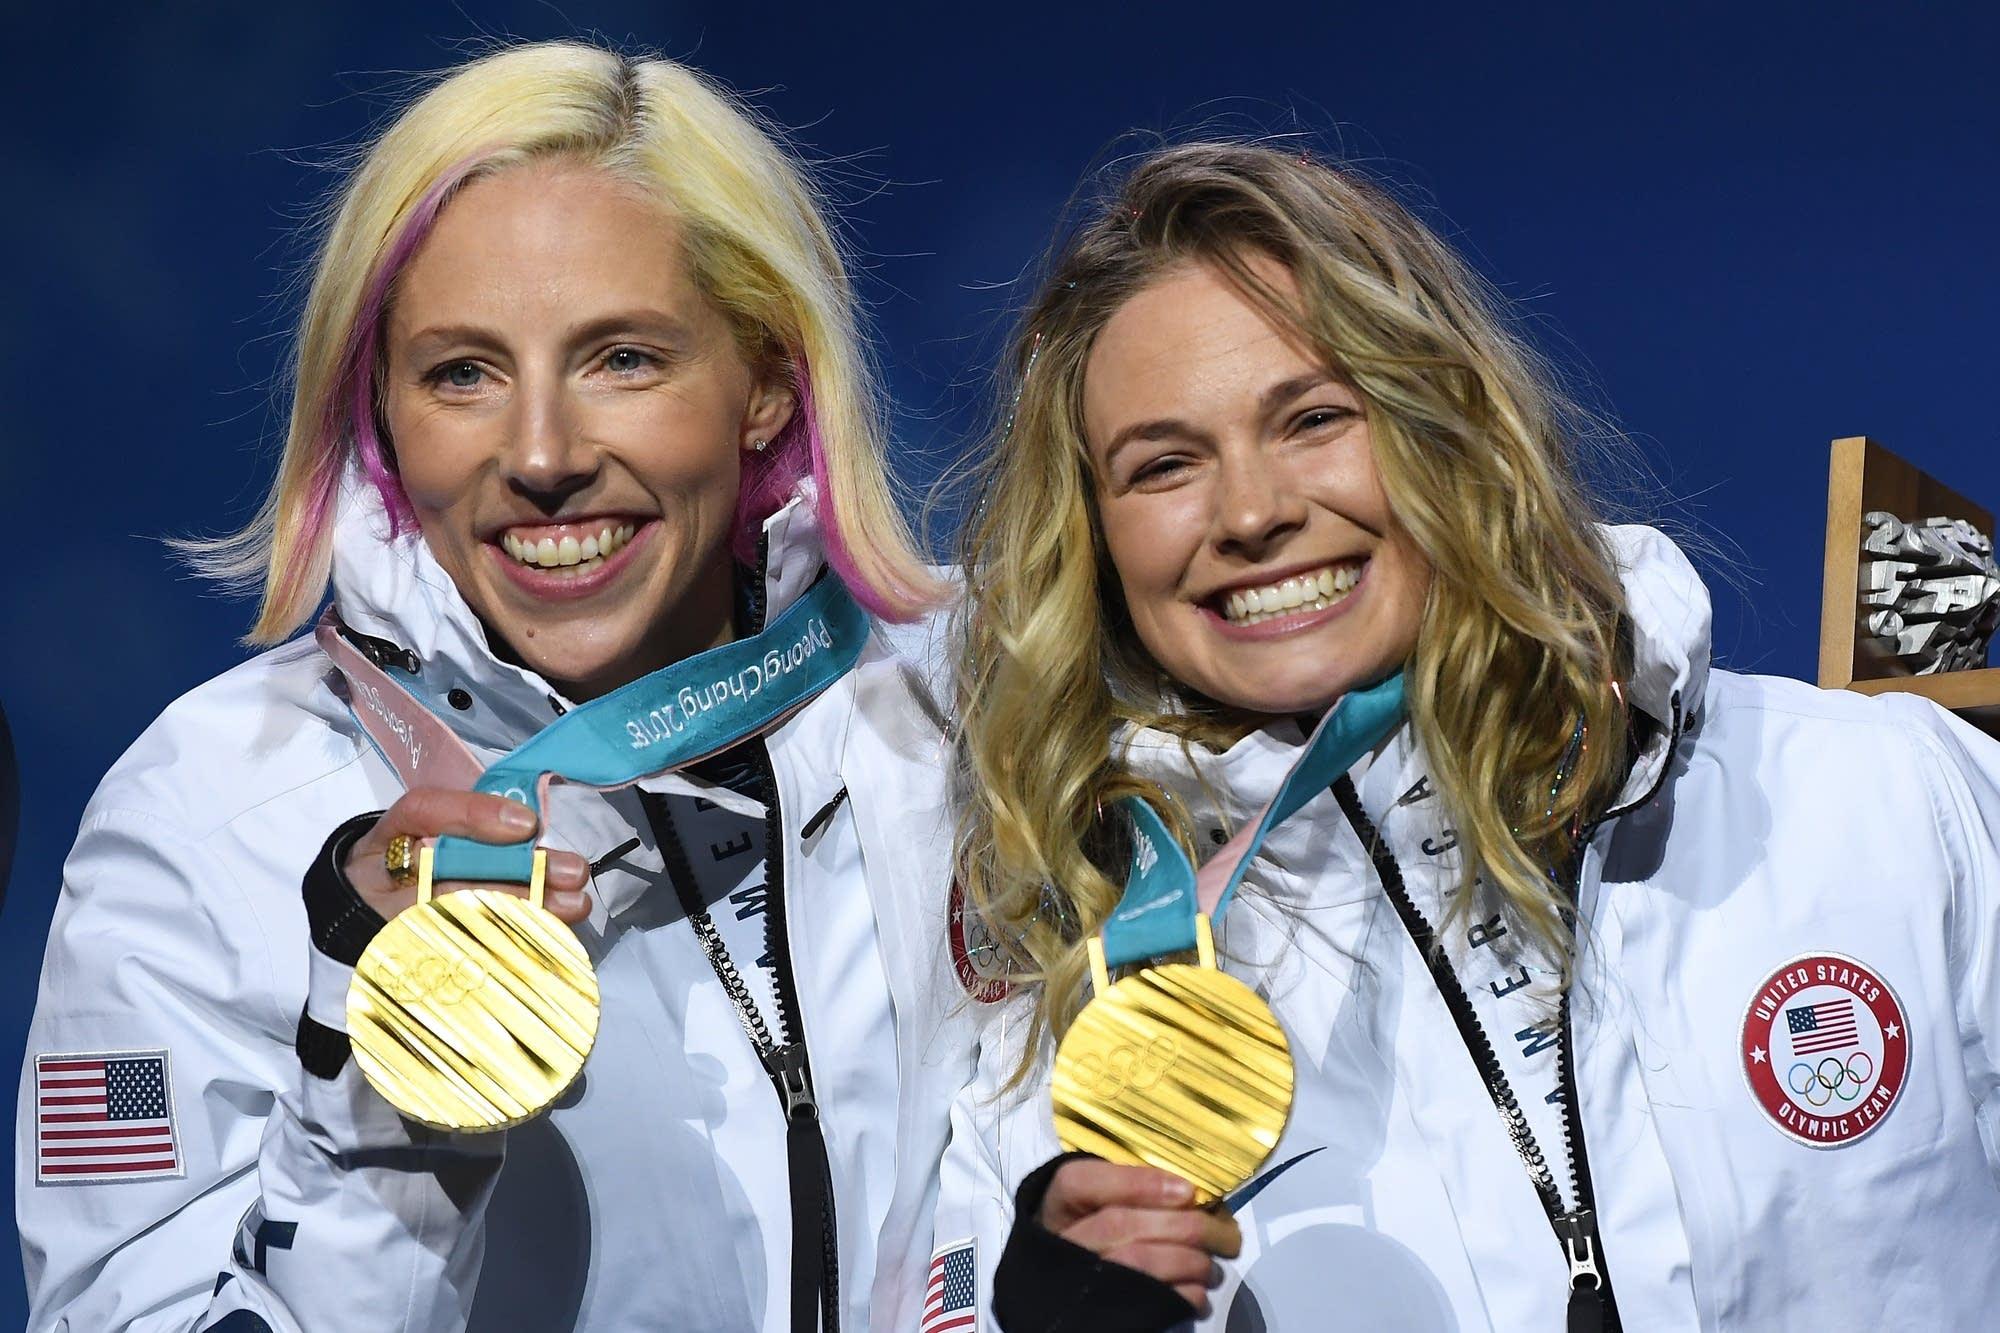 Gold medalists Kikkan Randall and Jessica Diggins.